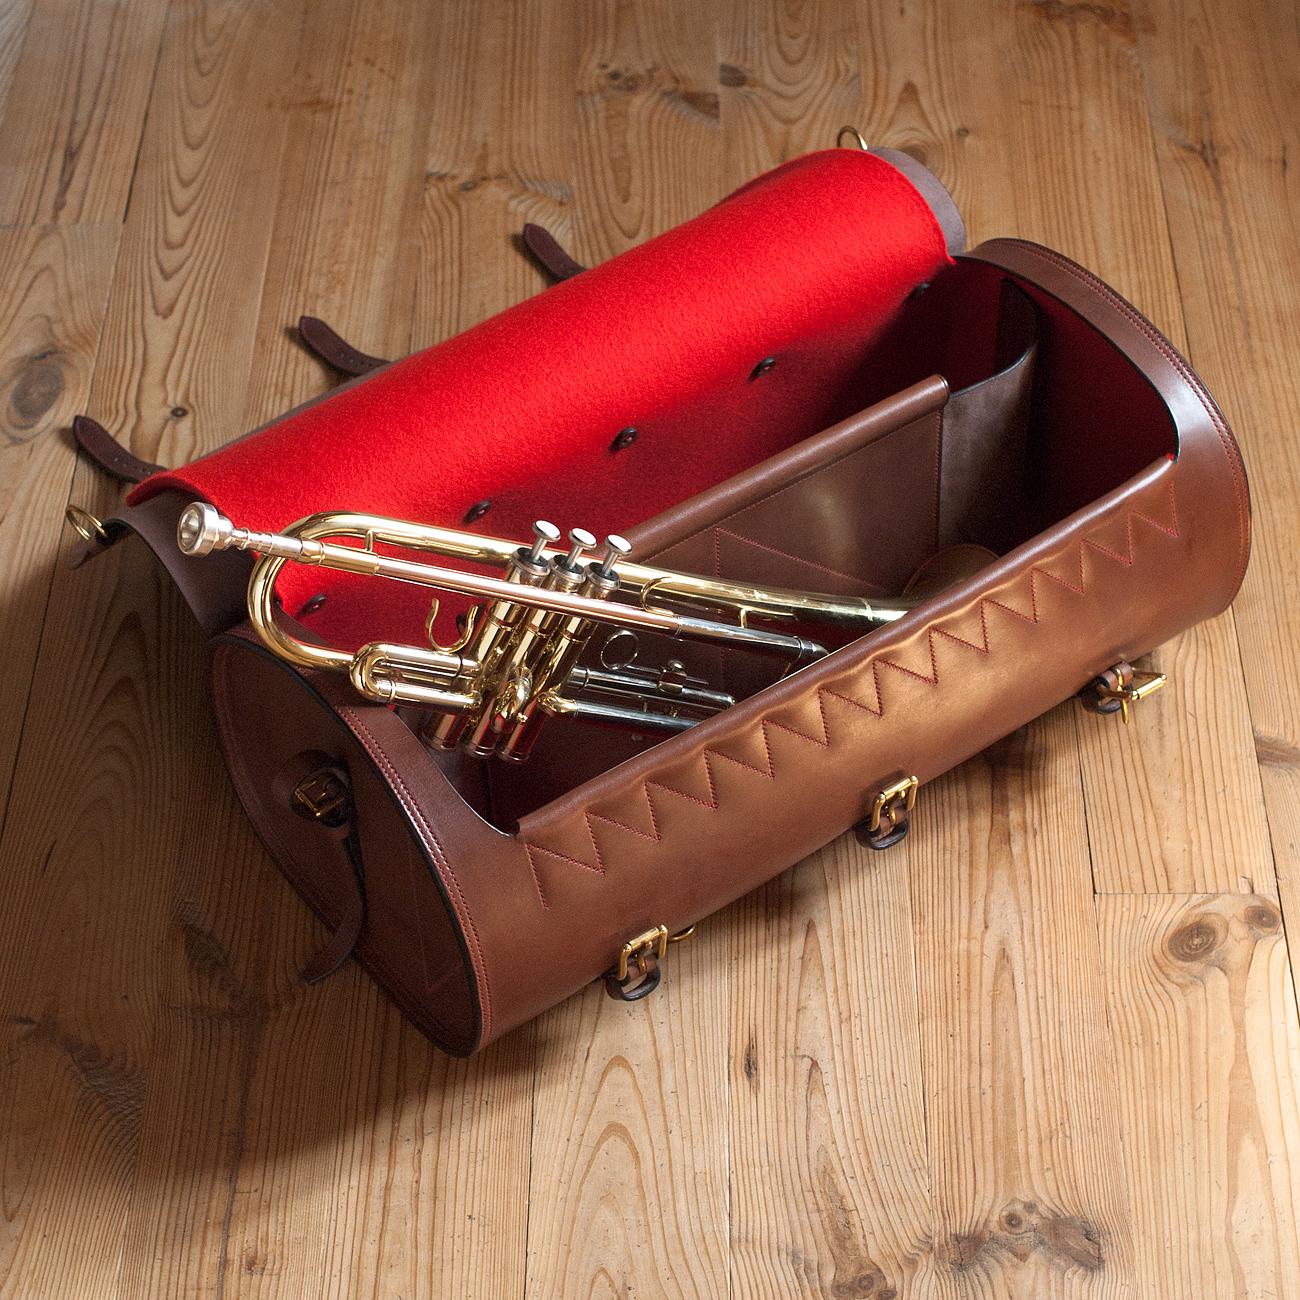 sacoche_trompette01_img01_HD